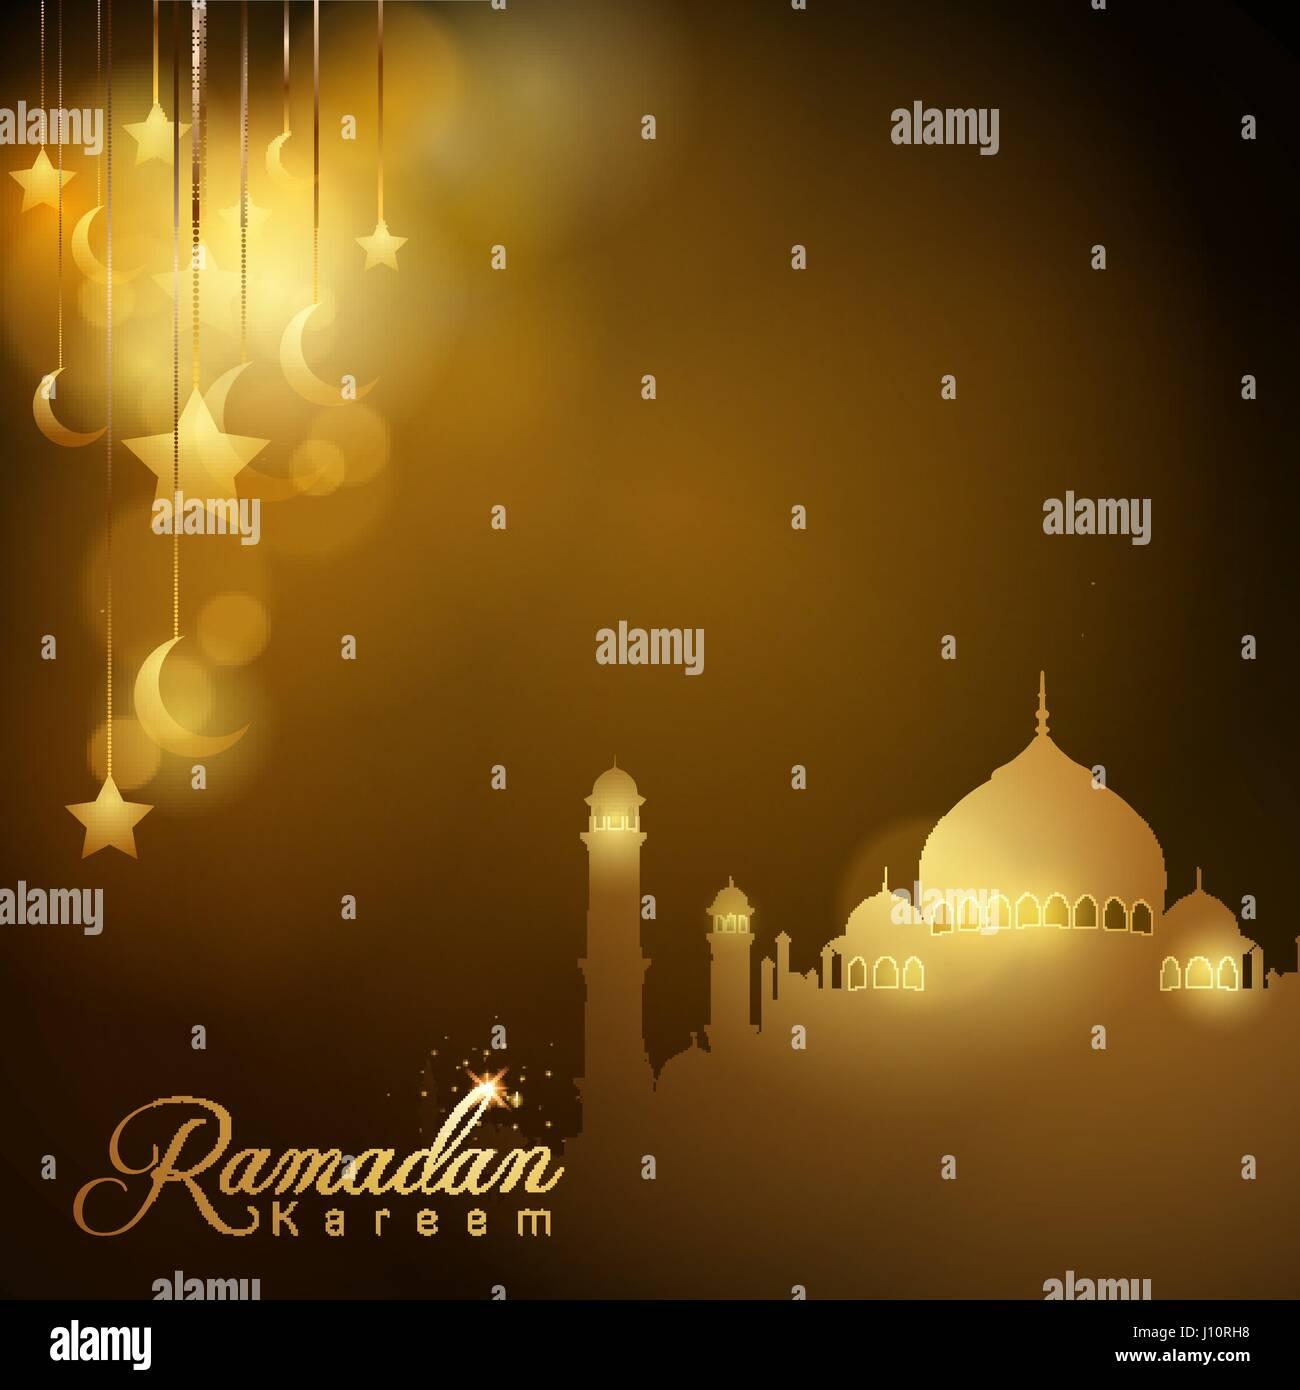 Mosque background for ramadan kareem stock photography image - Ramadan Kareem Islamic Design Background Glow Silhouette Mosque Star And Crescent